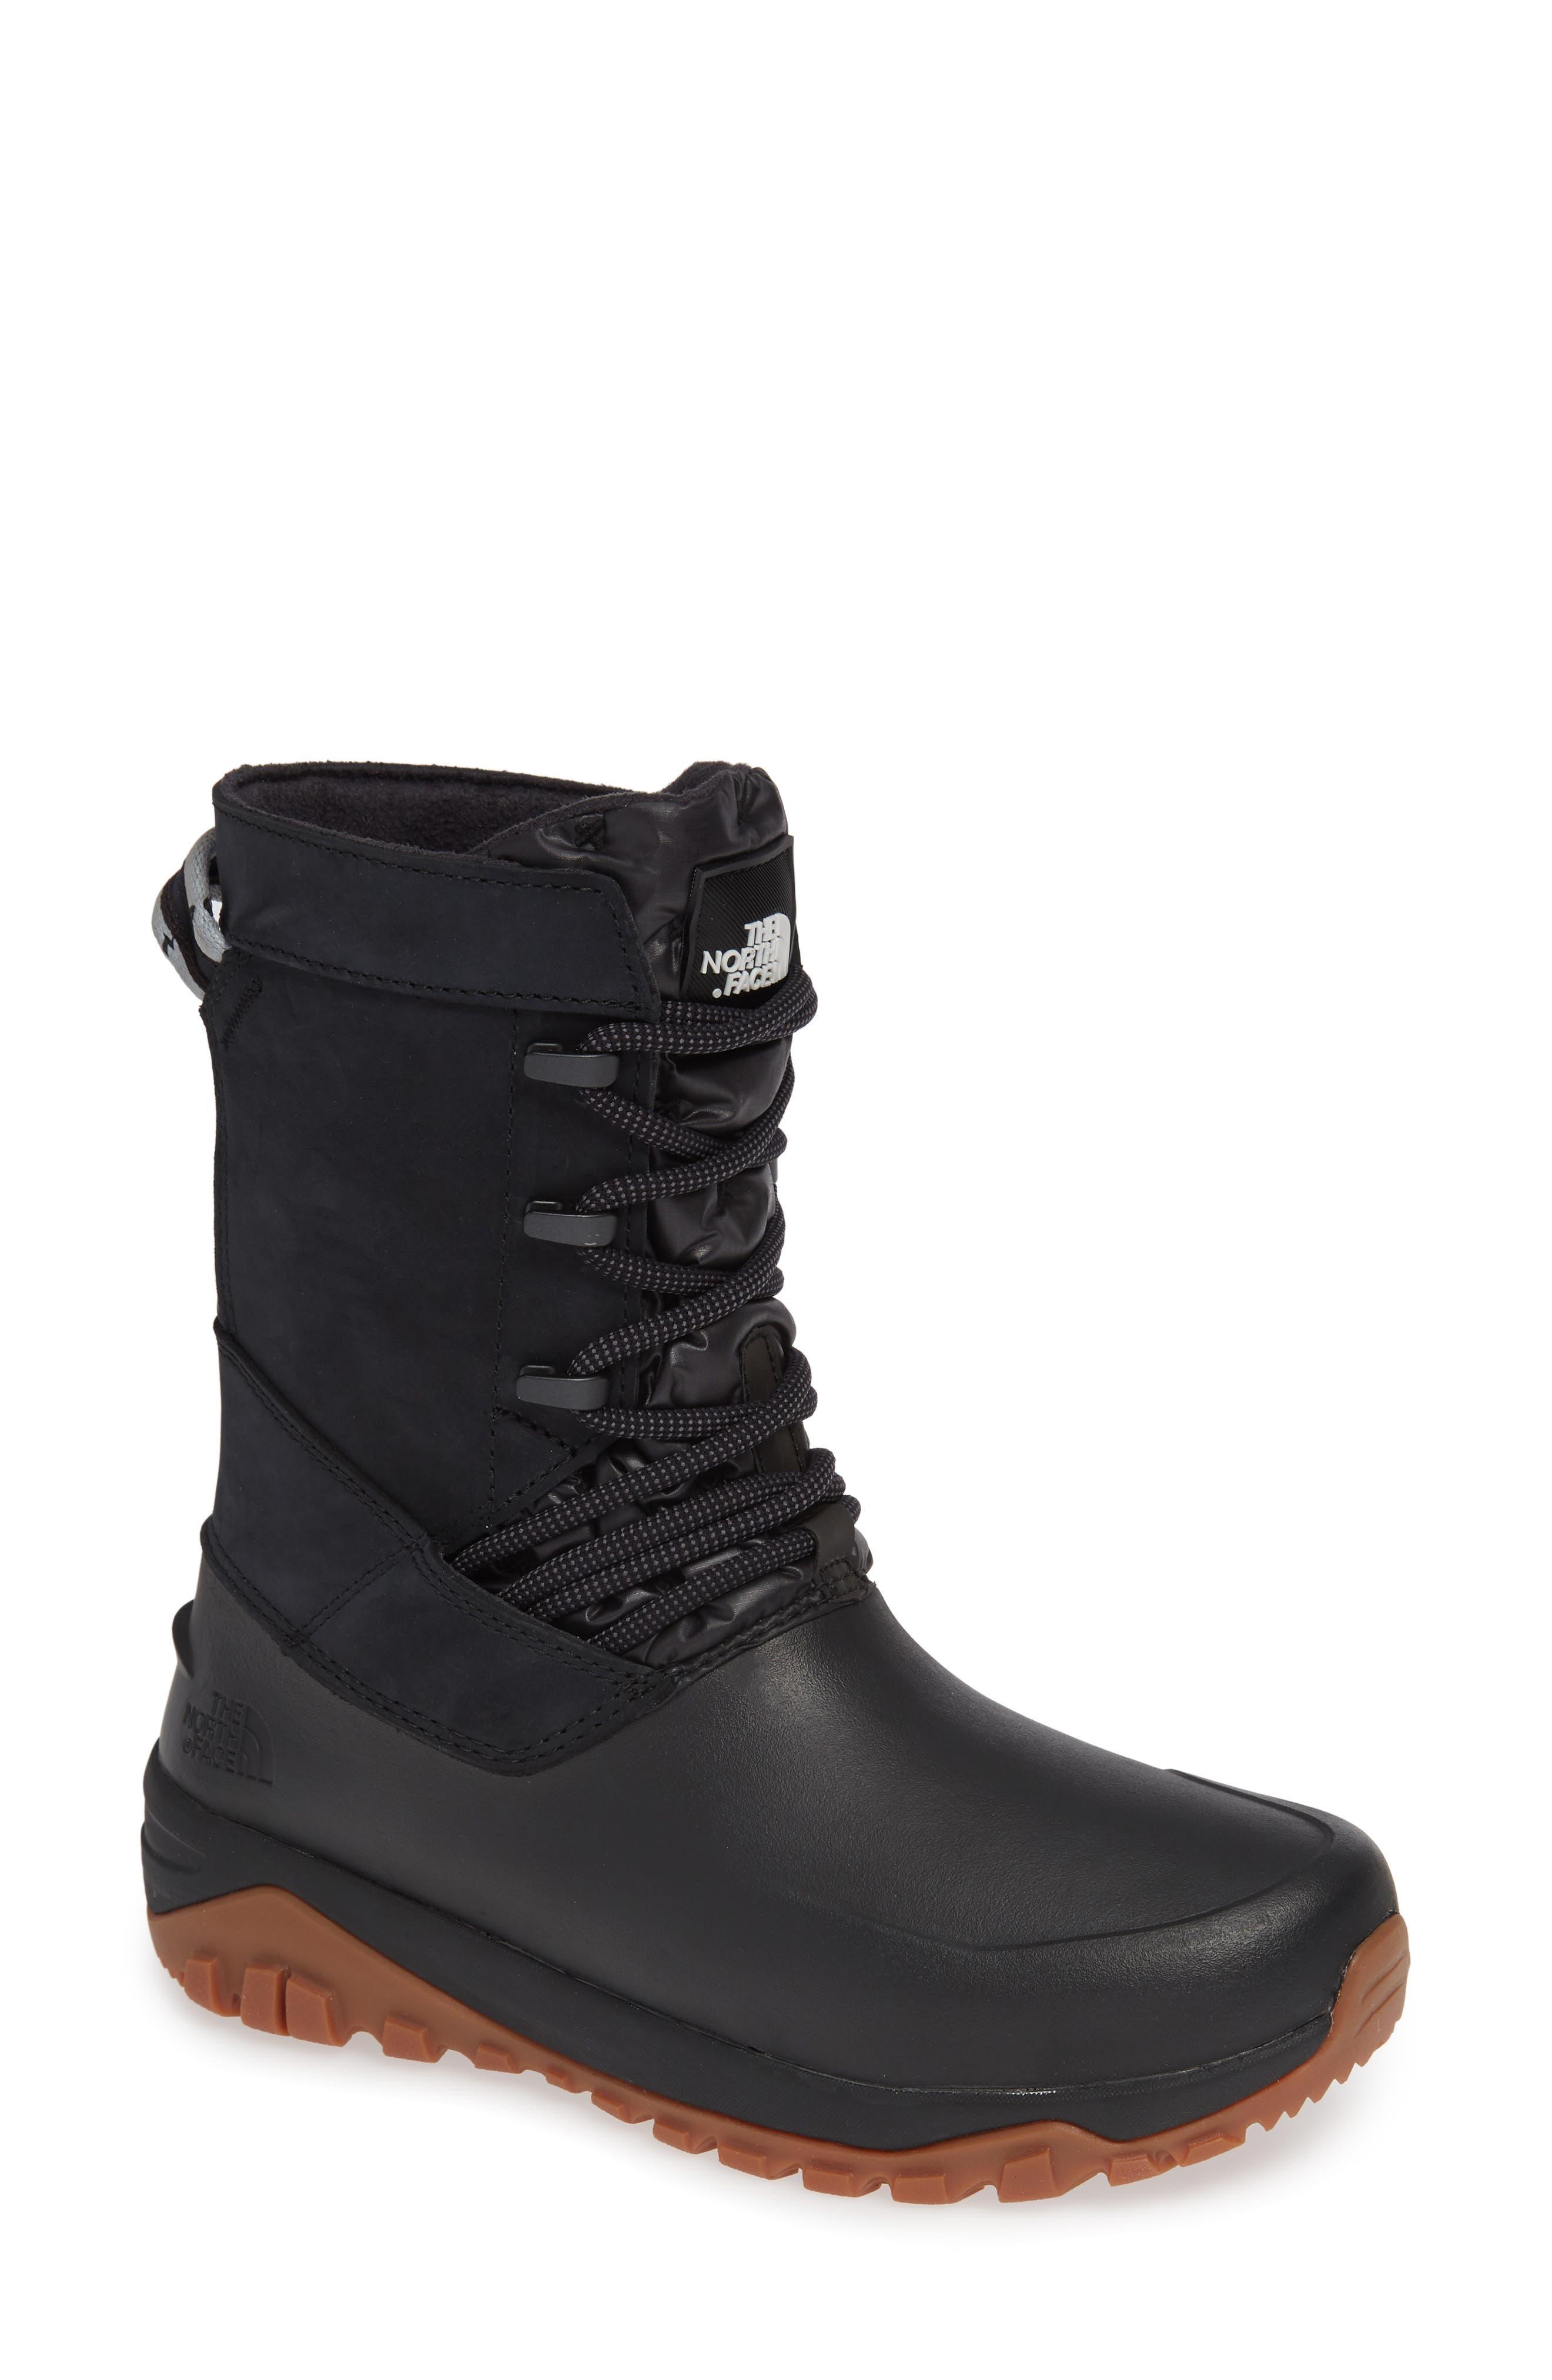 Yukiona Waterproof Winter Boot,                         Main,                         color, BLACK/ BLACK